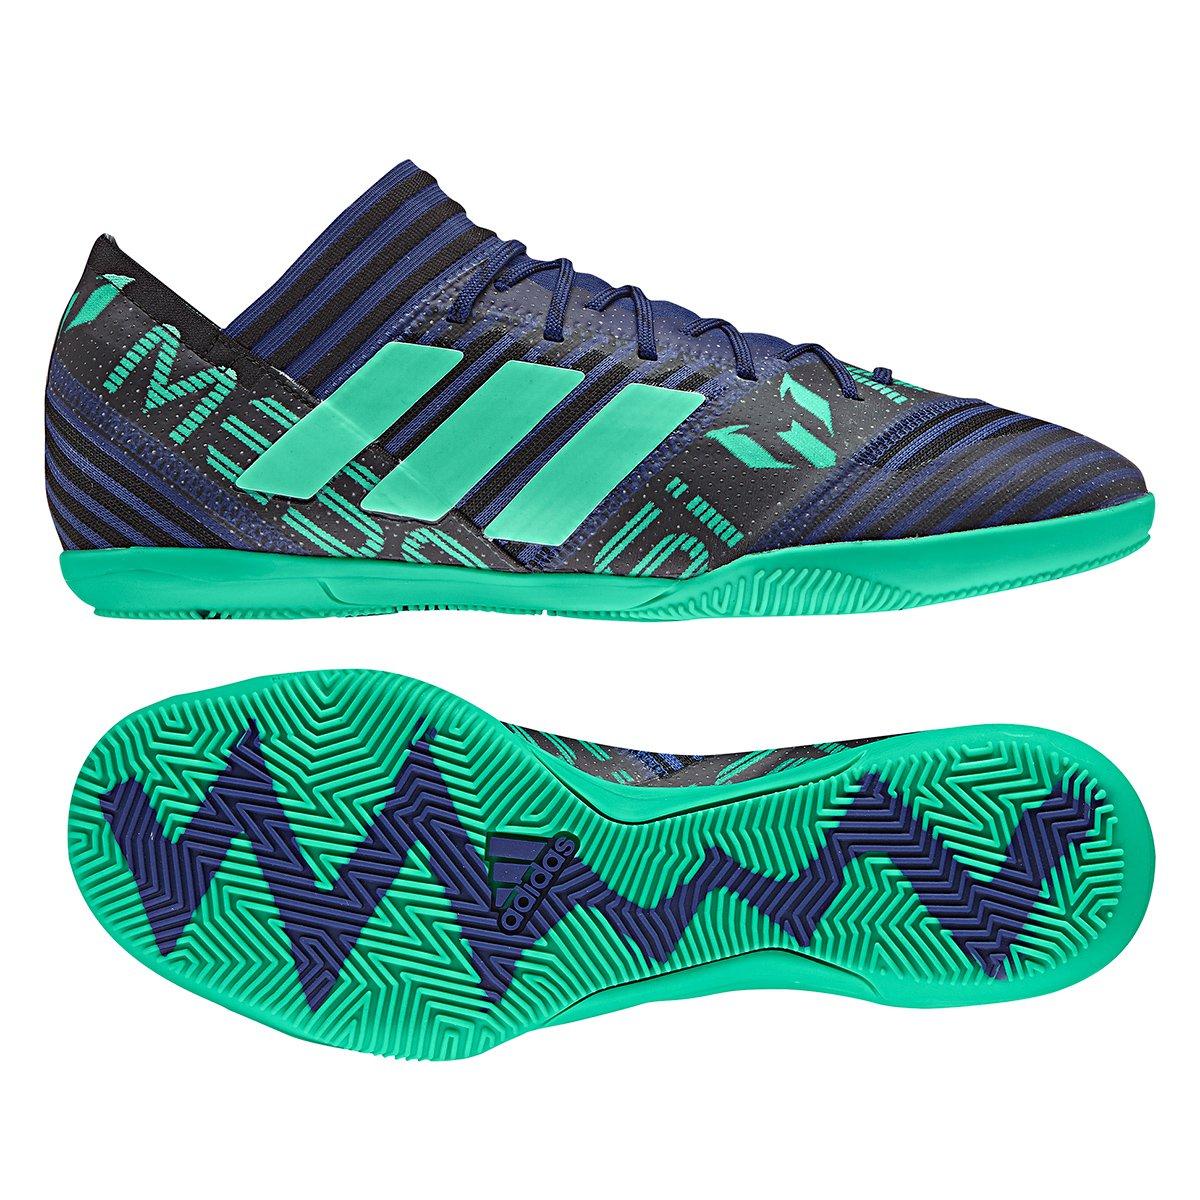 aeb40dd027579 Chuteira Futsal Adidas Nemeziz Messi 17.3 IN - Compre Agora